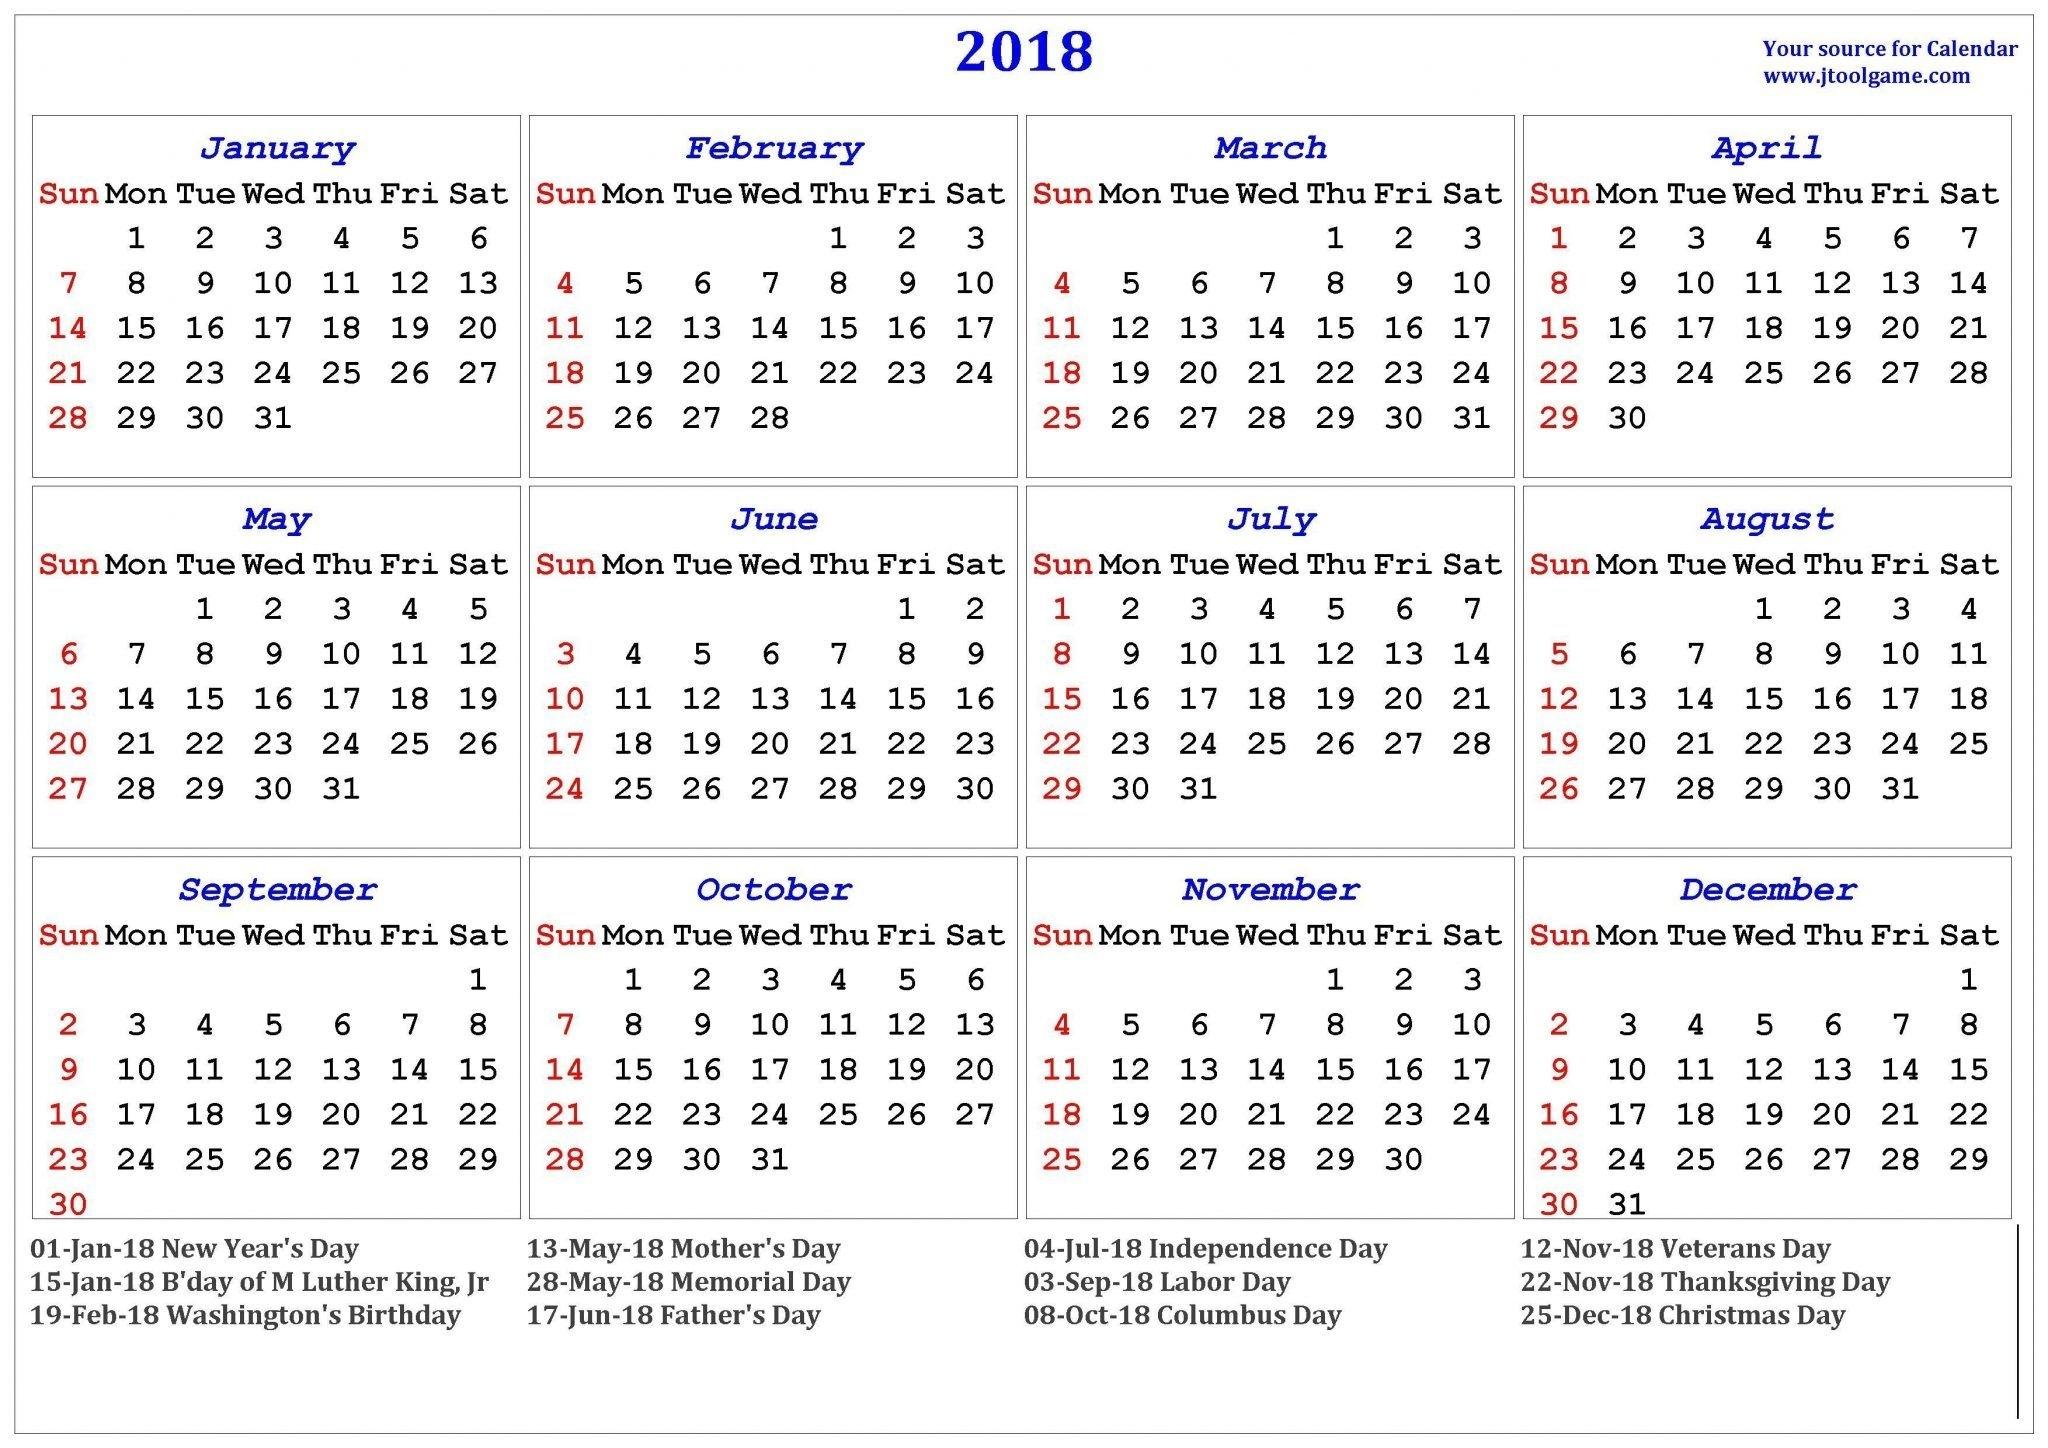 2019 Holidays Usa | Blank November 2018 Calendar | Printable in 2020 Printable Liturgical Calendar Free